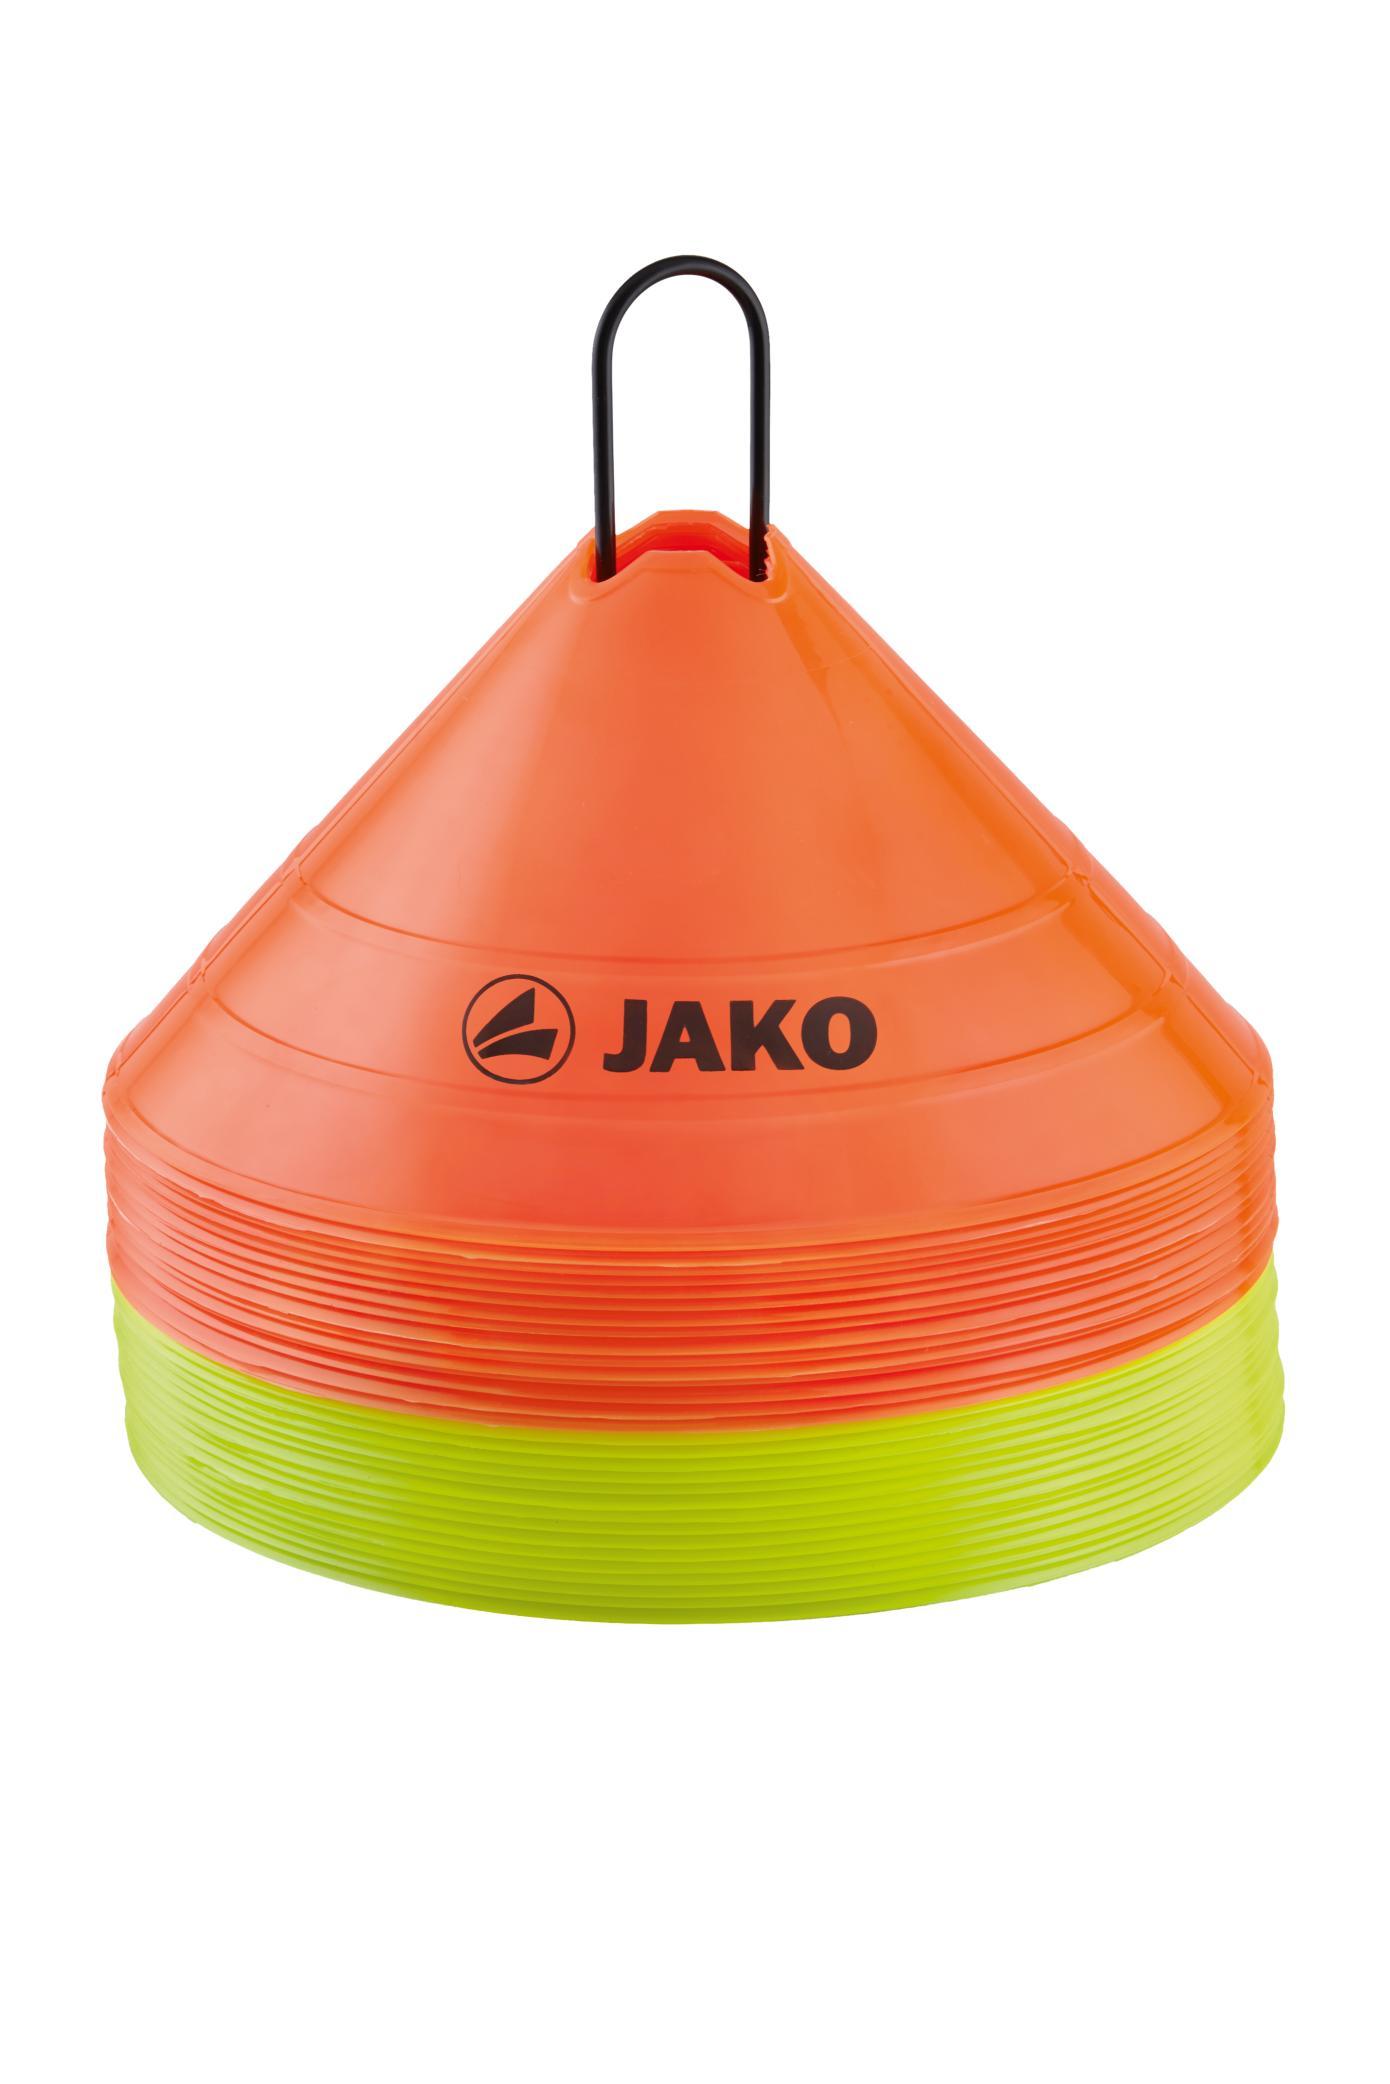 Jako Markingshoedjes - 30 cm diameter - Oranje/Geel